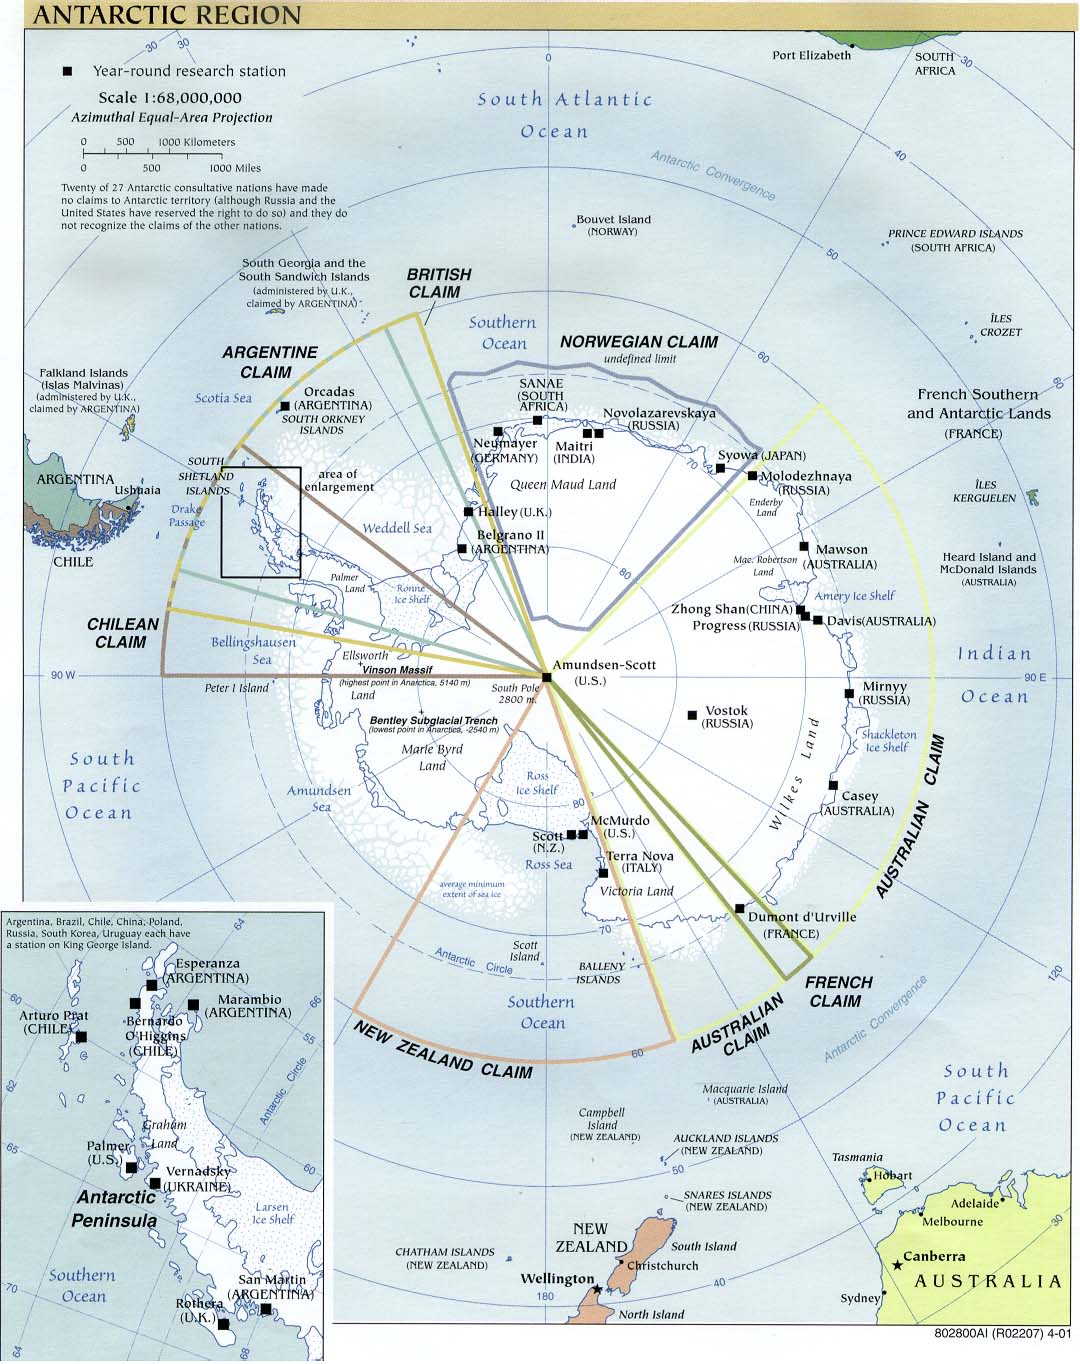 Mapa Politico de la Antártida 2001